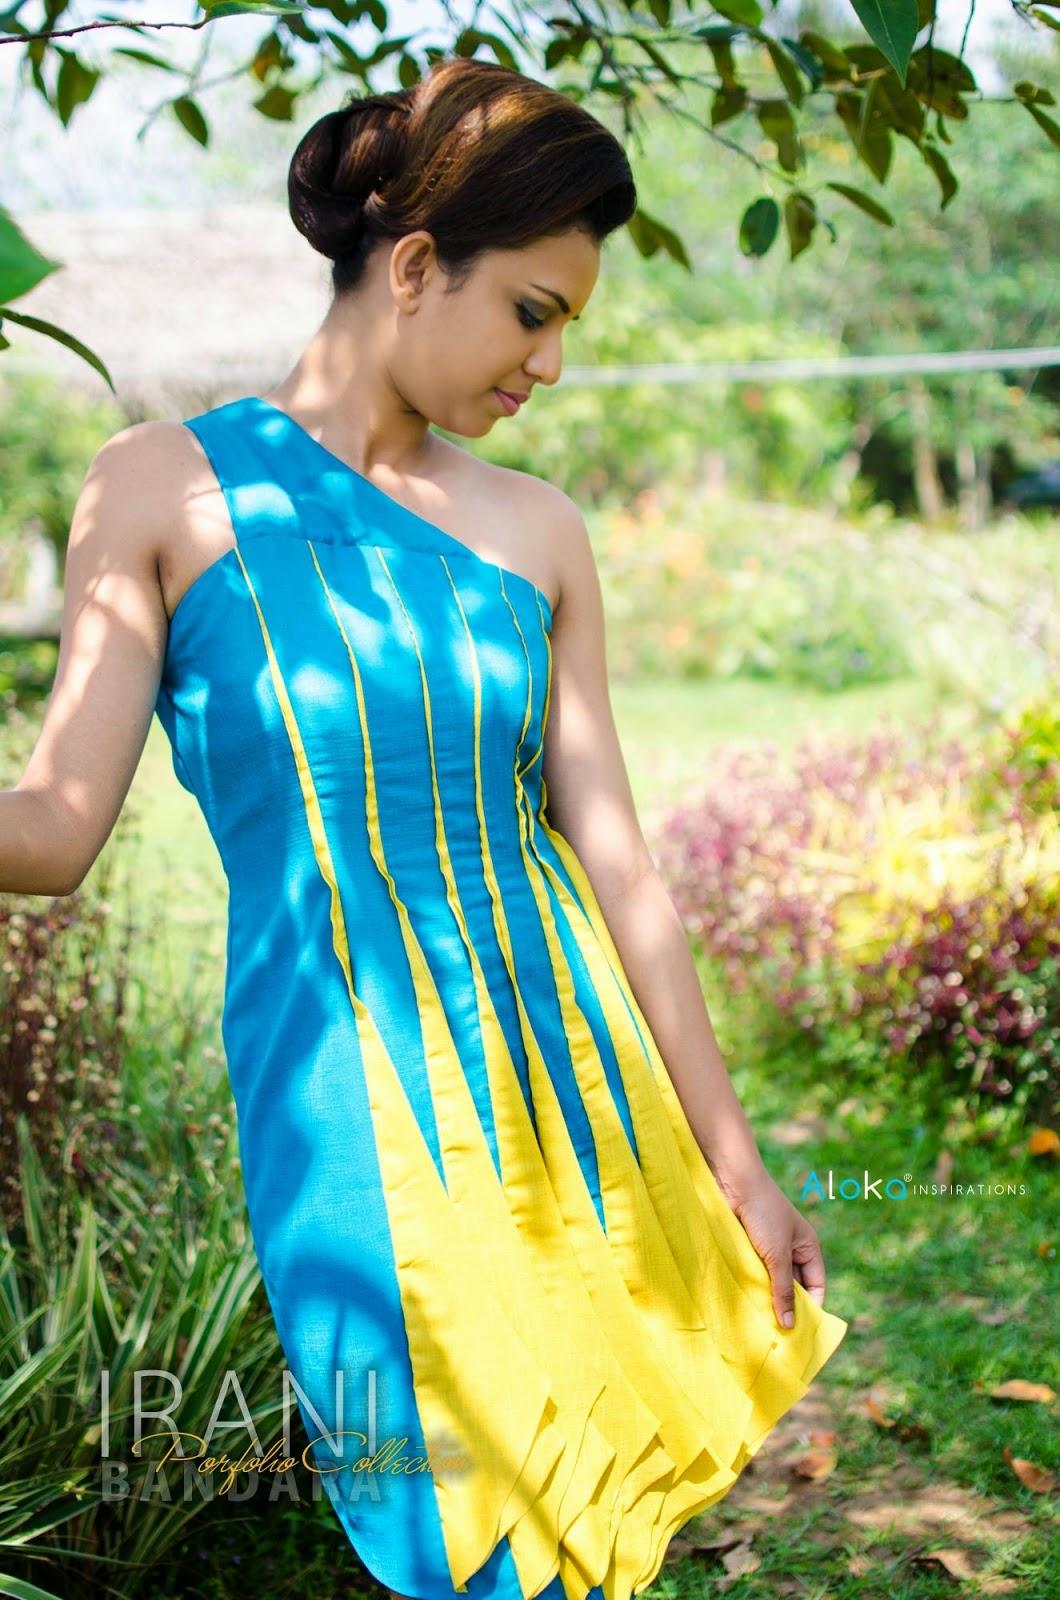 Sachi Wickramasinghe sl model